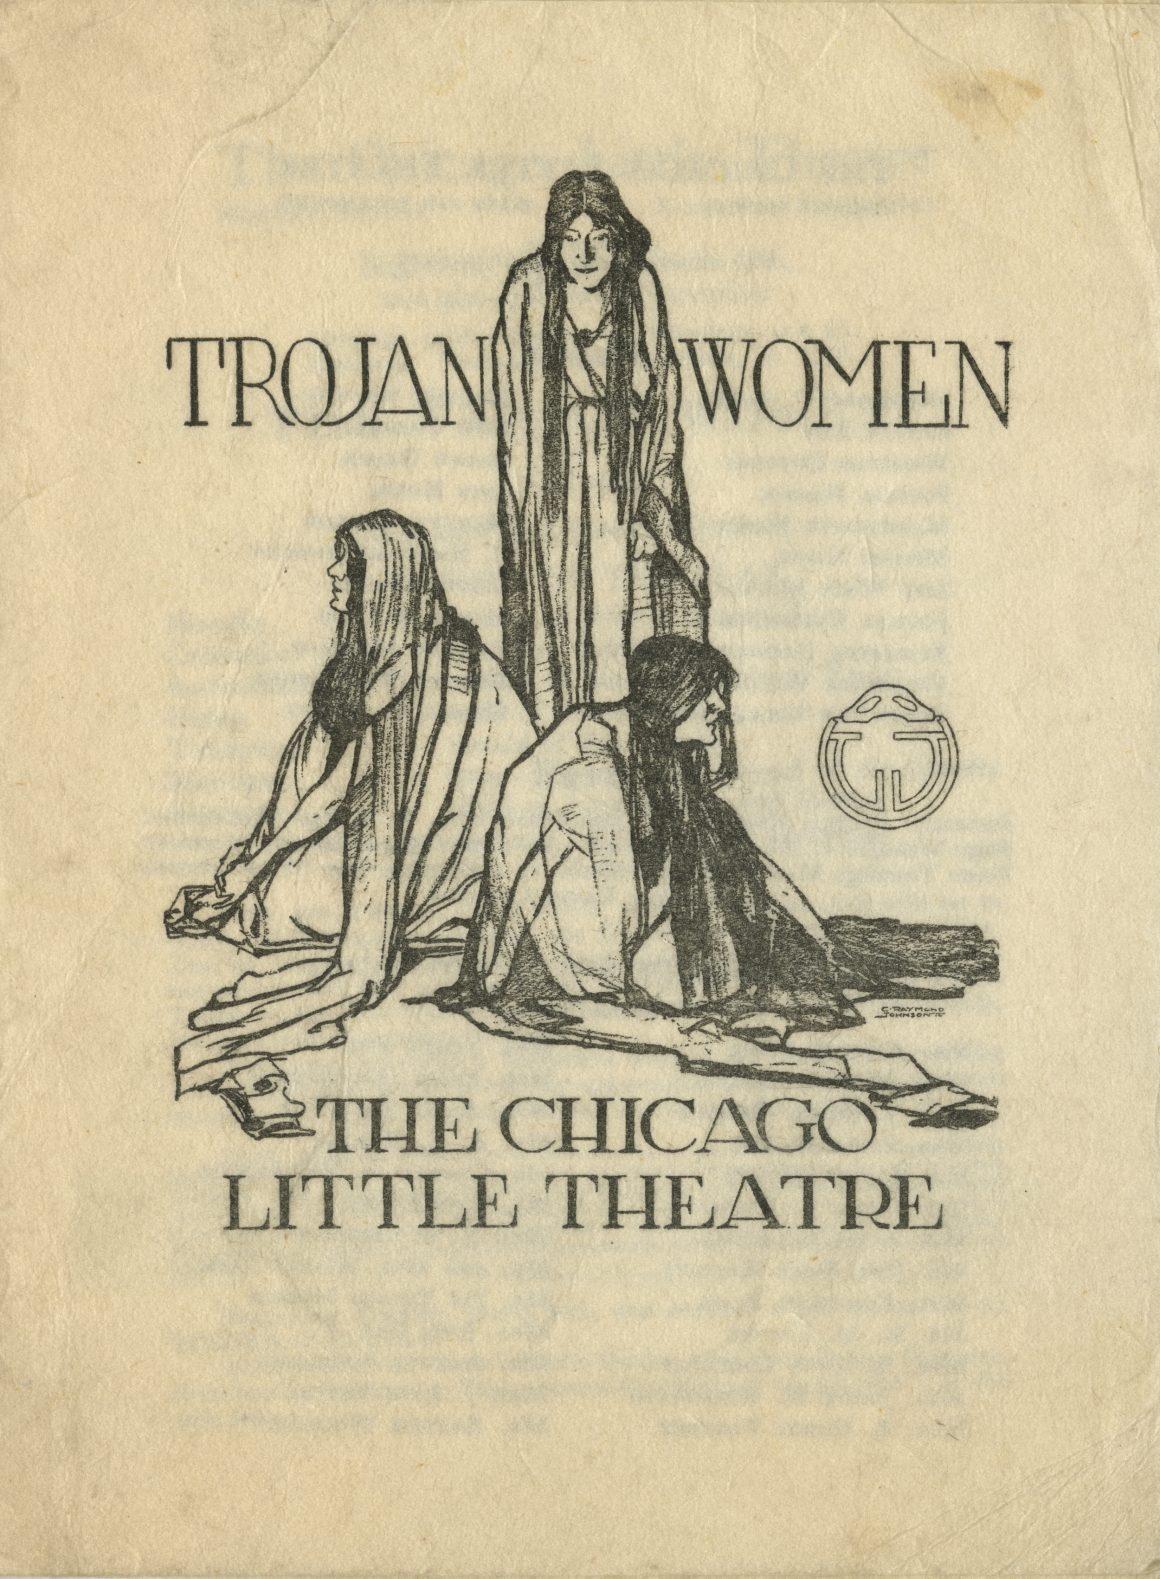 Program cover for The Trojan Women, Chicago Little Theatre, 1914